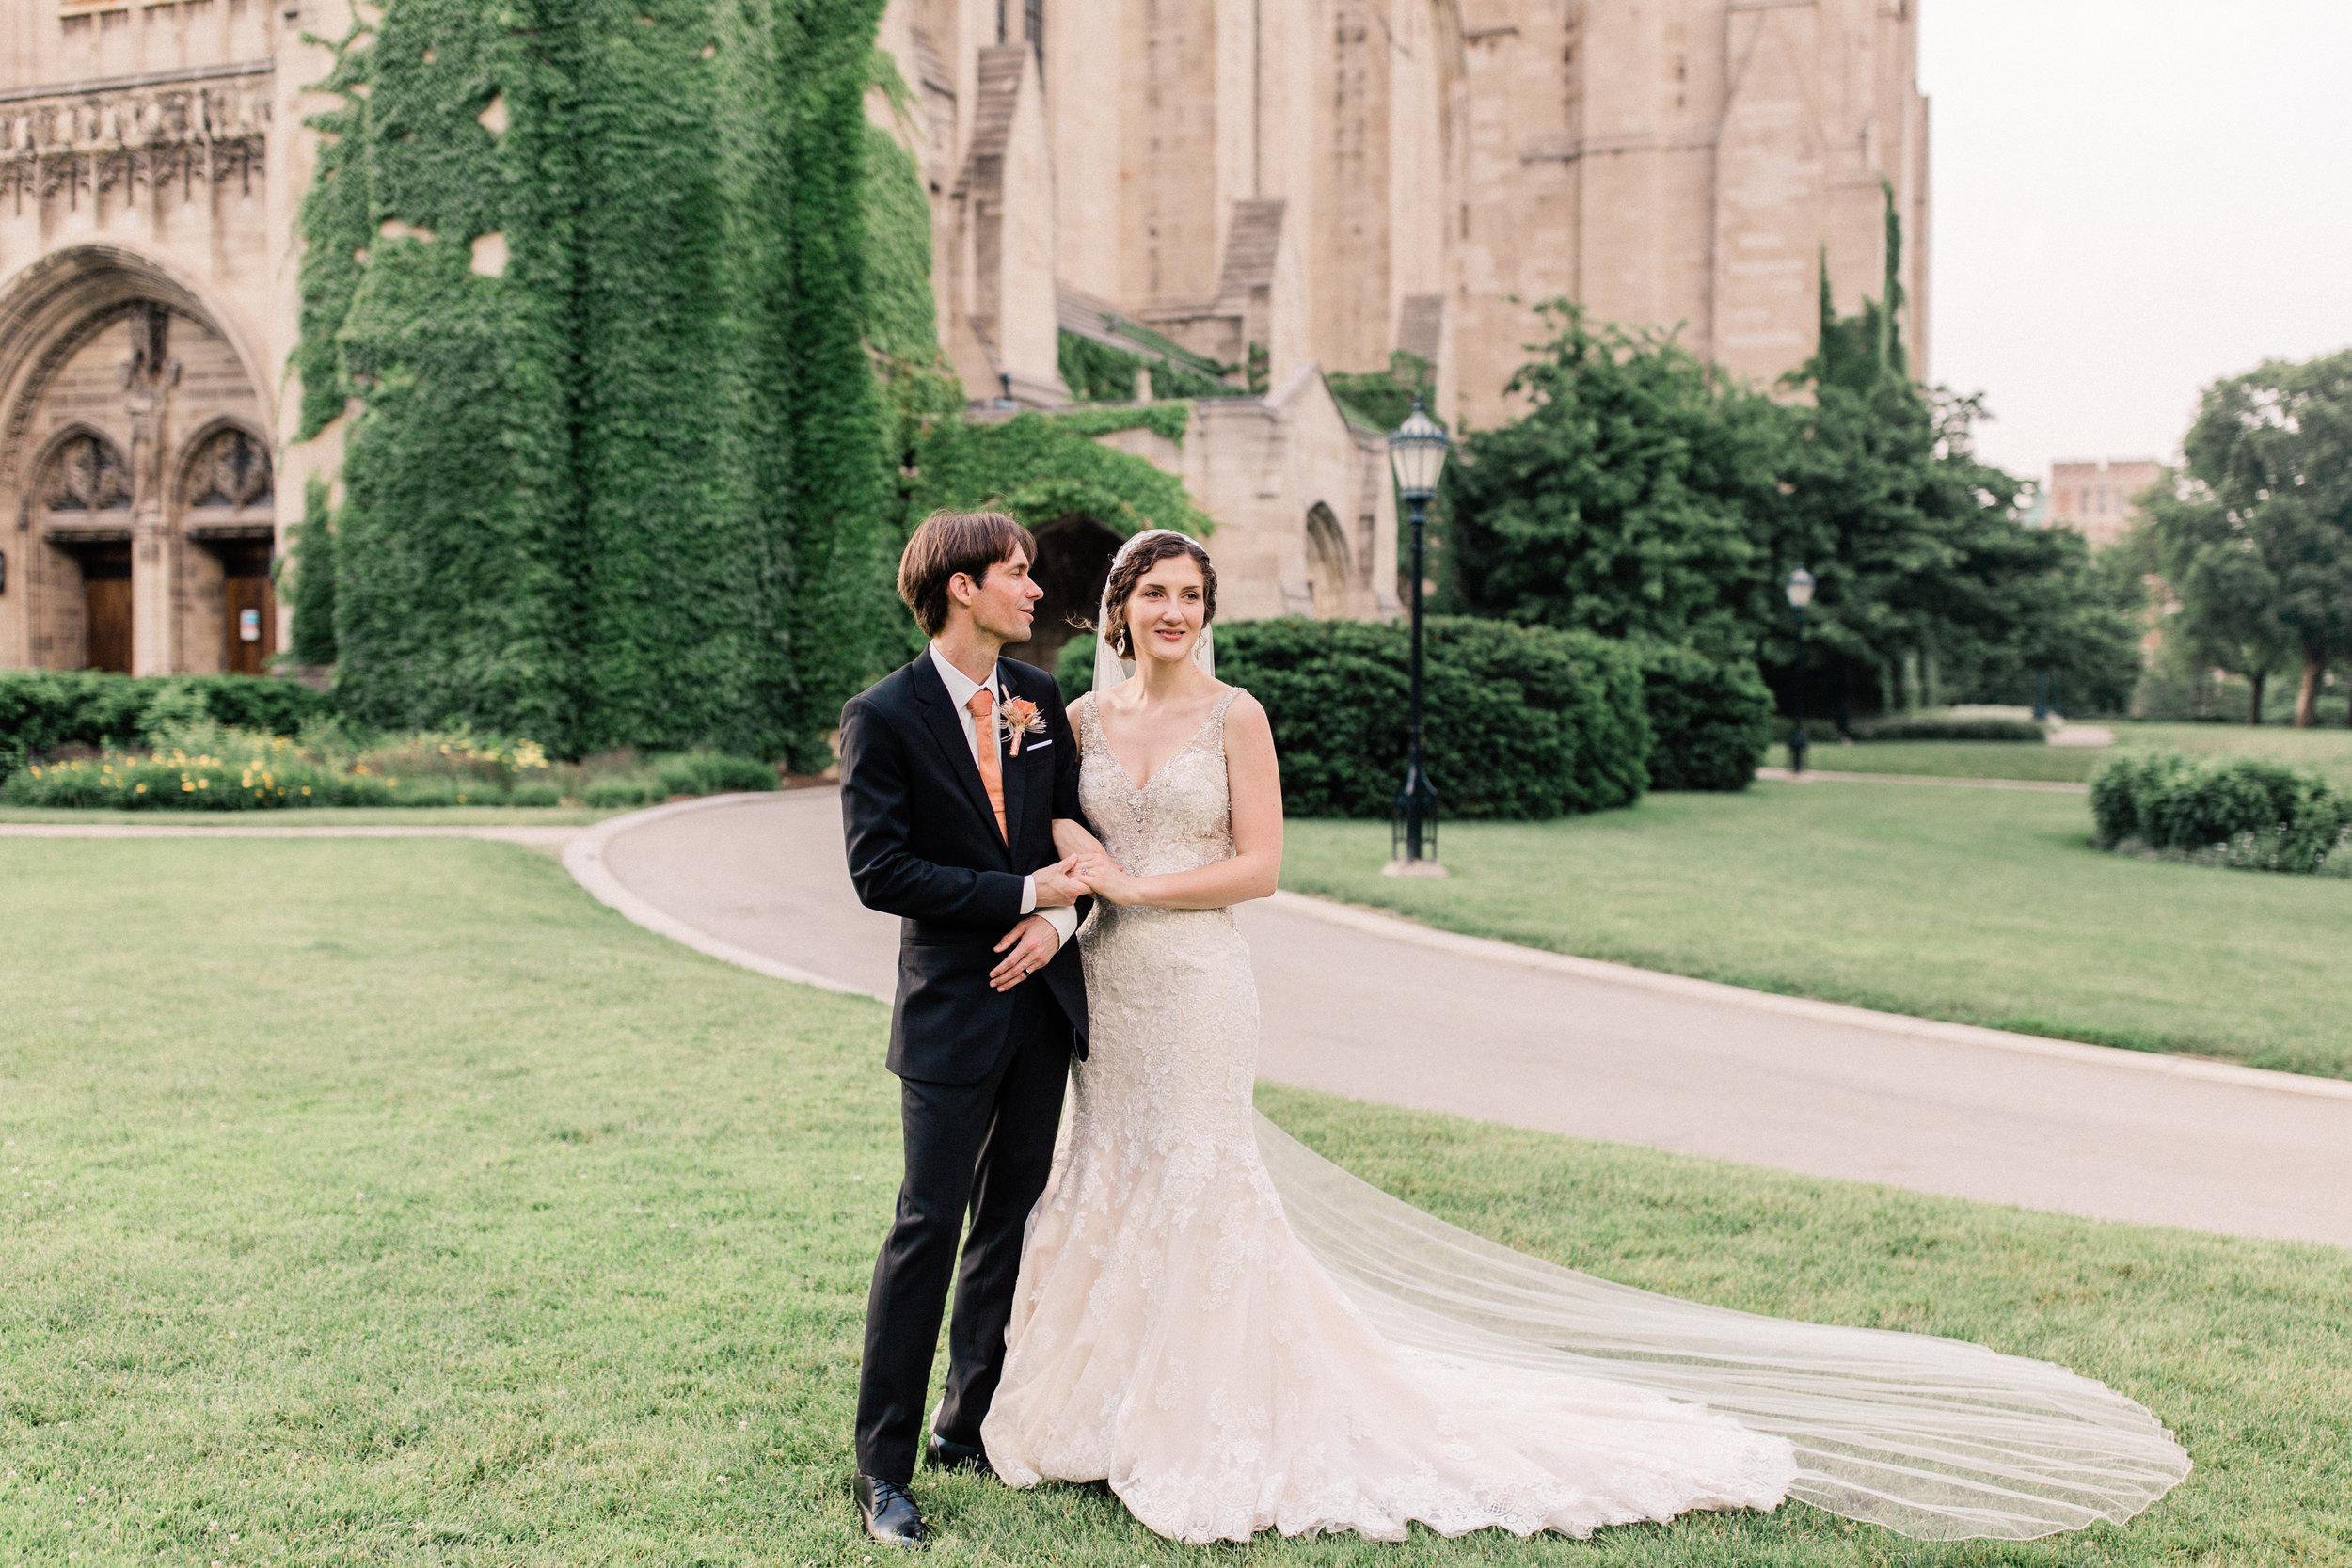 Dorothy_Louise_Photography_University_of_Chicago_Chapel_Wedding-71.jpg